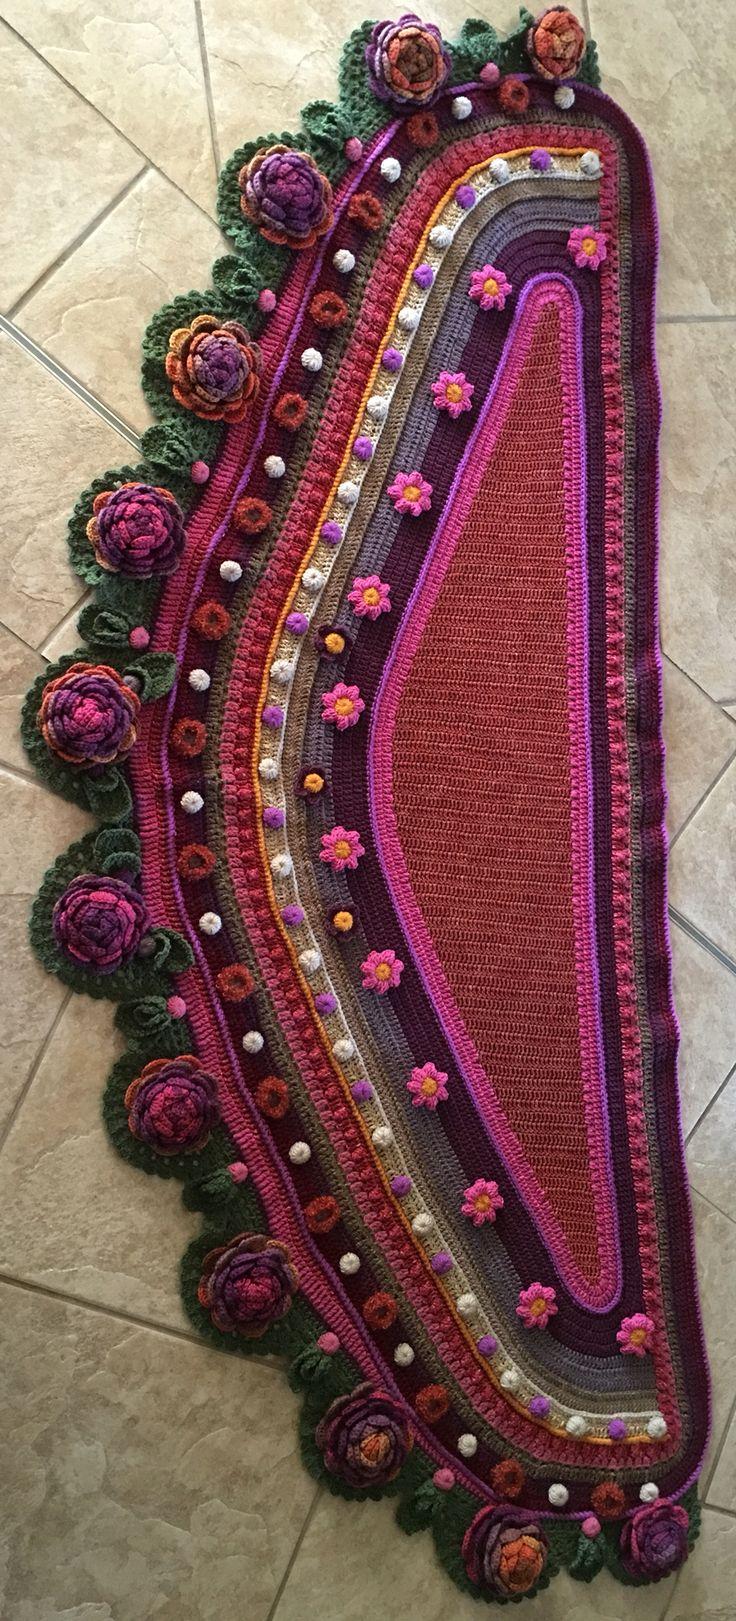 My shawl done by Gretha Botma -inspired by Adinda Zoutman's work.